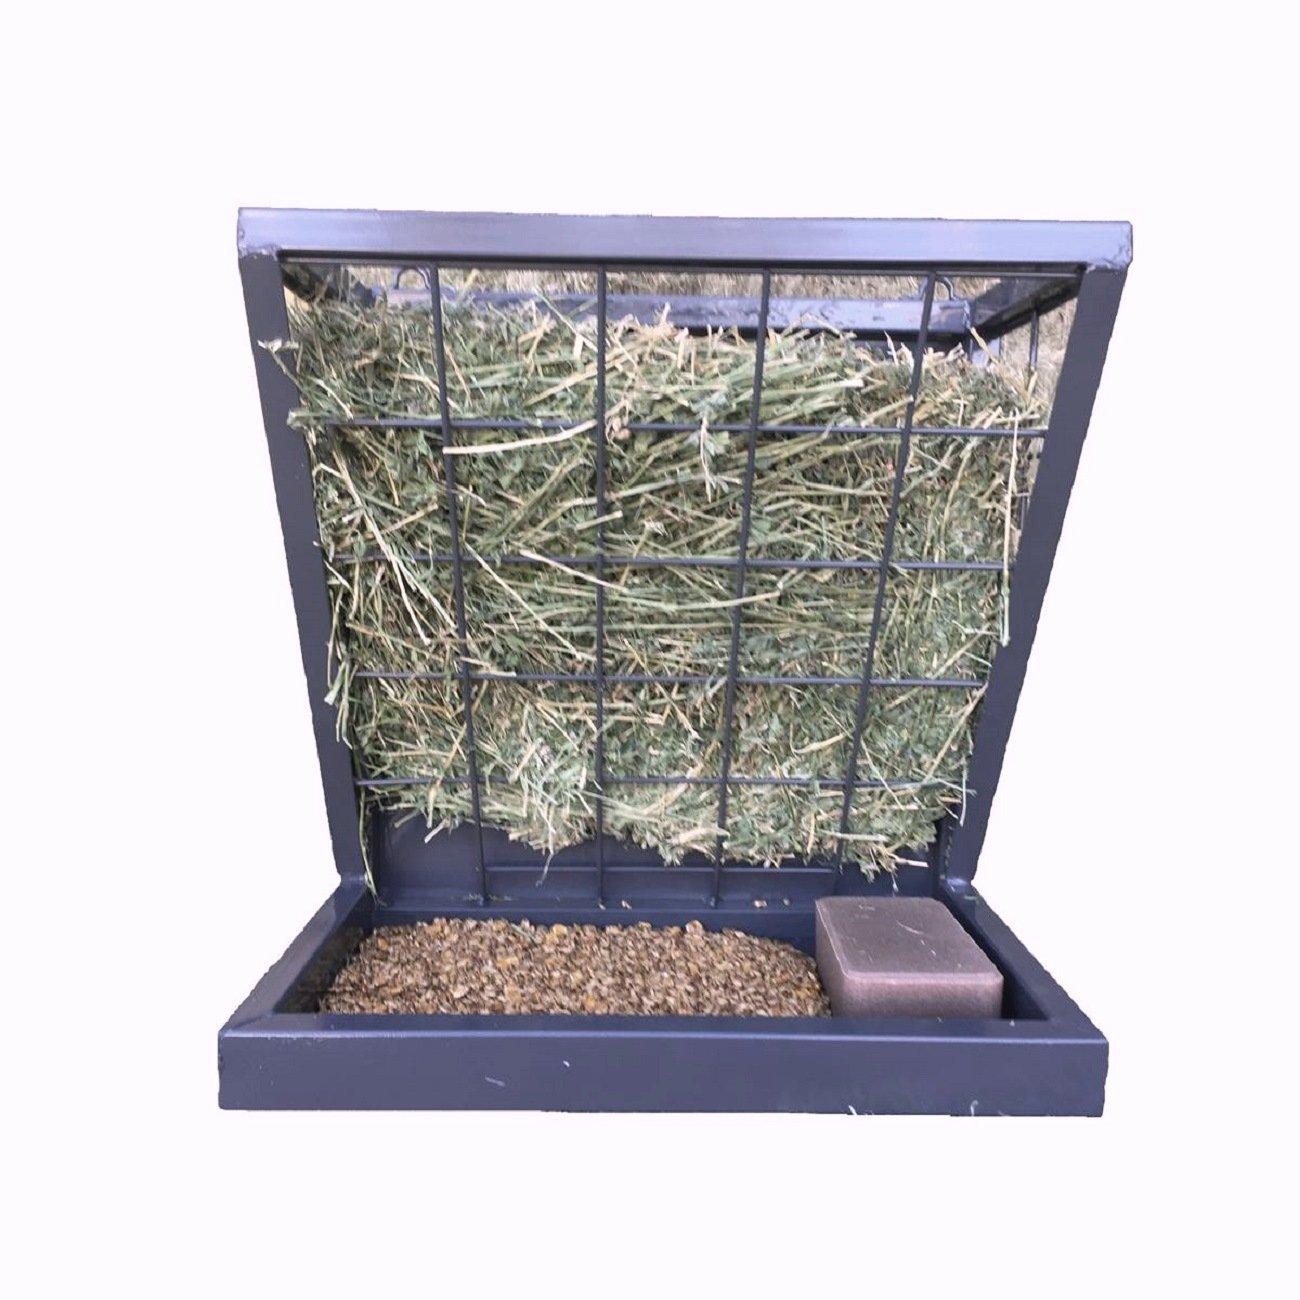 Rugged Ranch Powder Coated Steel 3-in-1 Wall Feeder - For Hay Grain or Salt - H: 12'' W: 21'' L: 21'' - Black